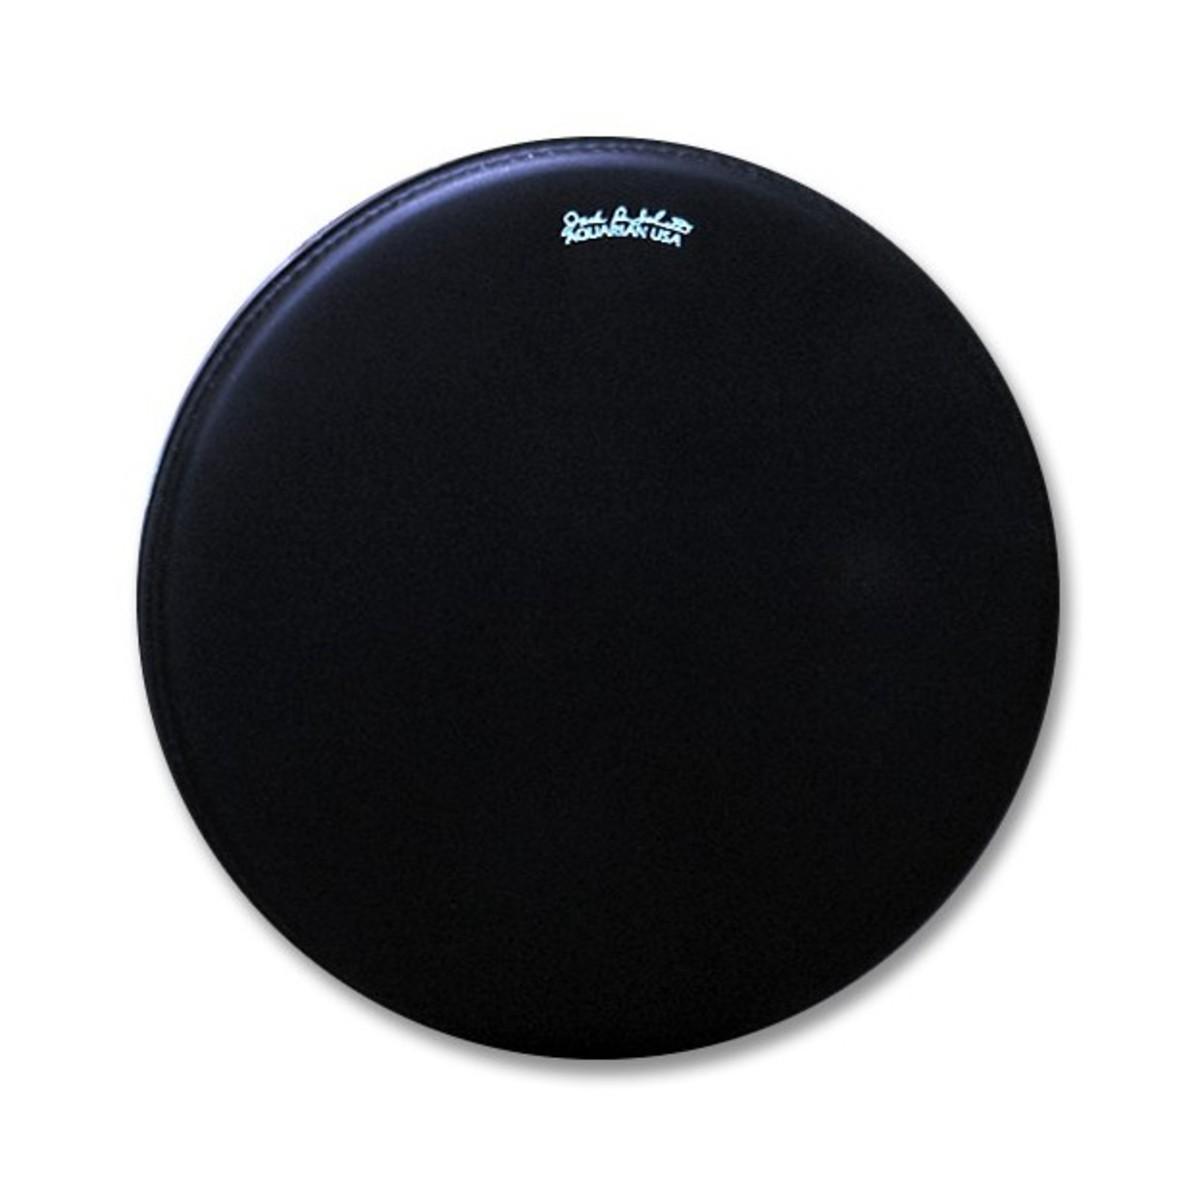 aquarian jack dejohnette texture coated 18 39 39 bass drum head black at gear4music. Black Bedroom Furniture Sets. Home Design Ideas